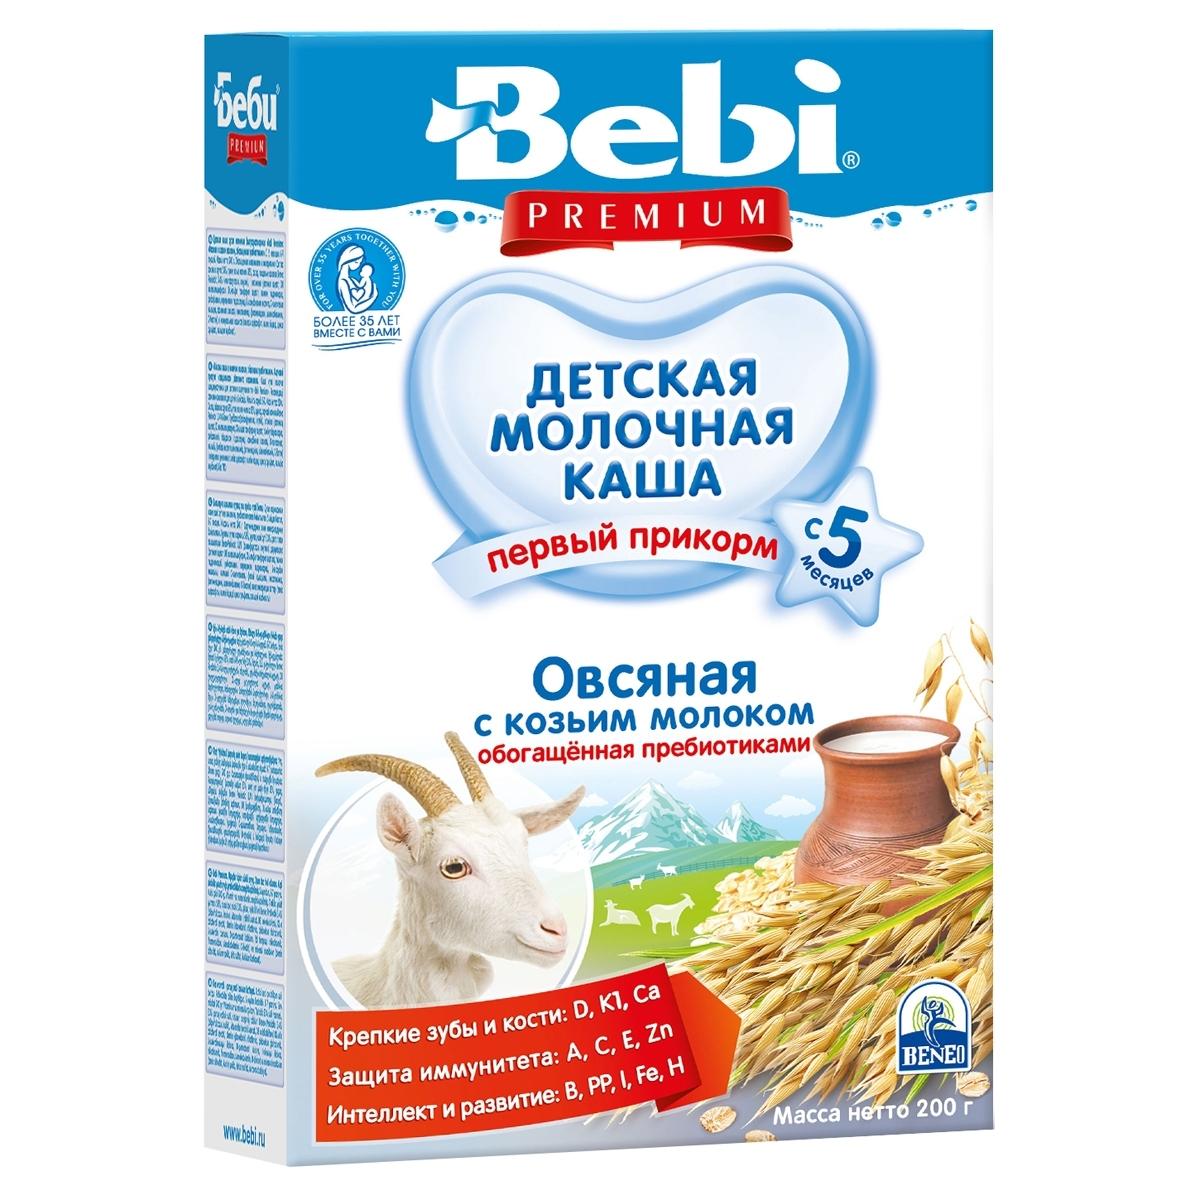 ���� Bebi Premium �� ������ ������ 200 �� ������� (� 5 ���)